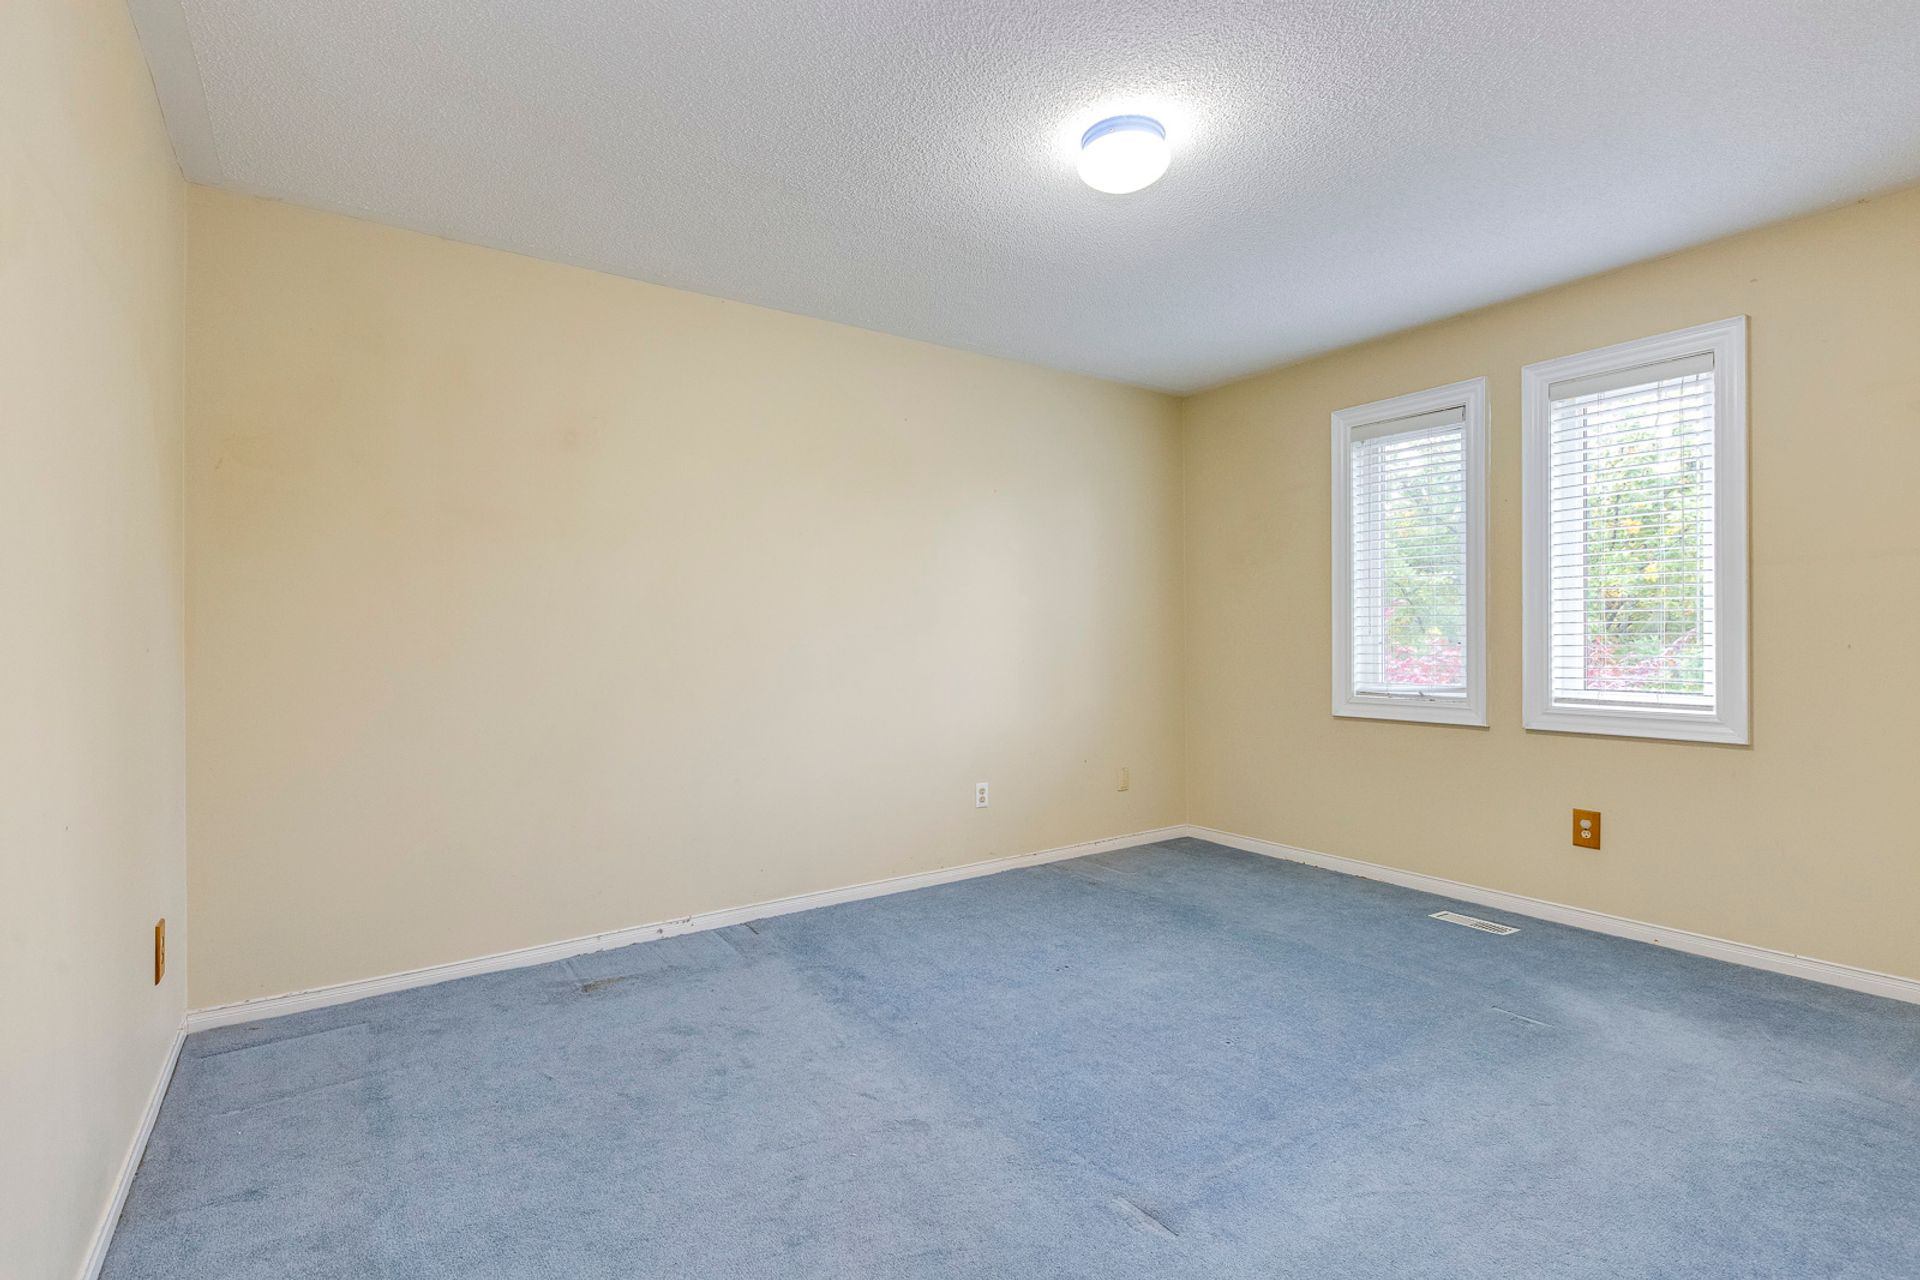 4th Bedroom - 1522 Estes Cres, Mississauga - Elite3 & Team at 1522 Estes Crescent, East Credit, Mississauga